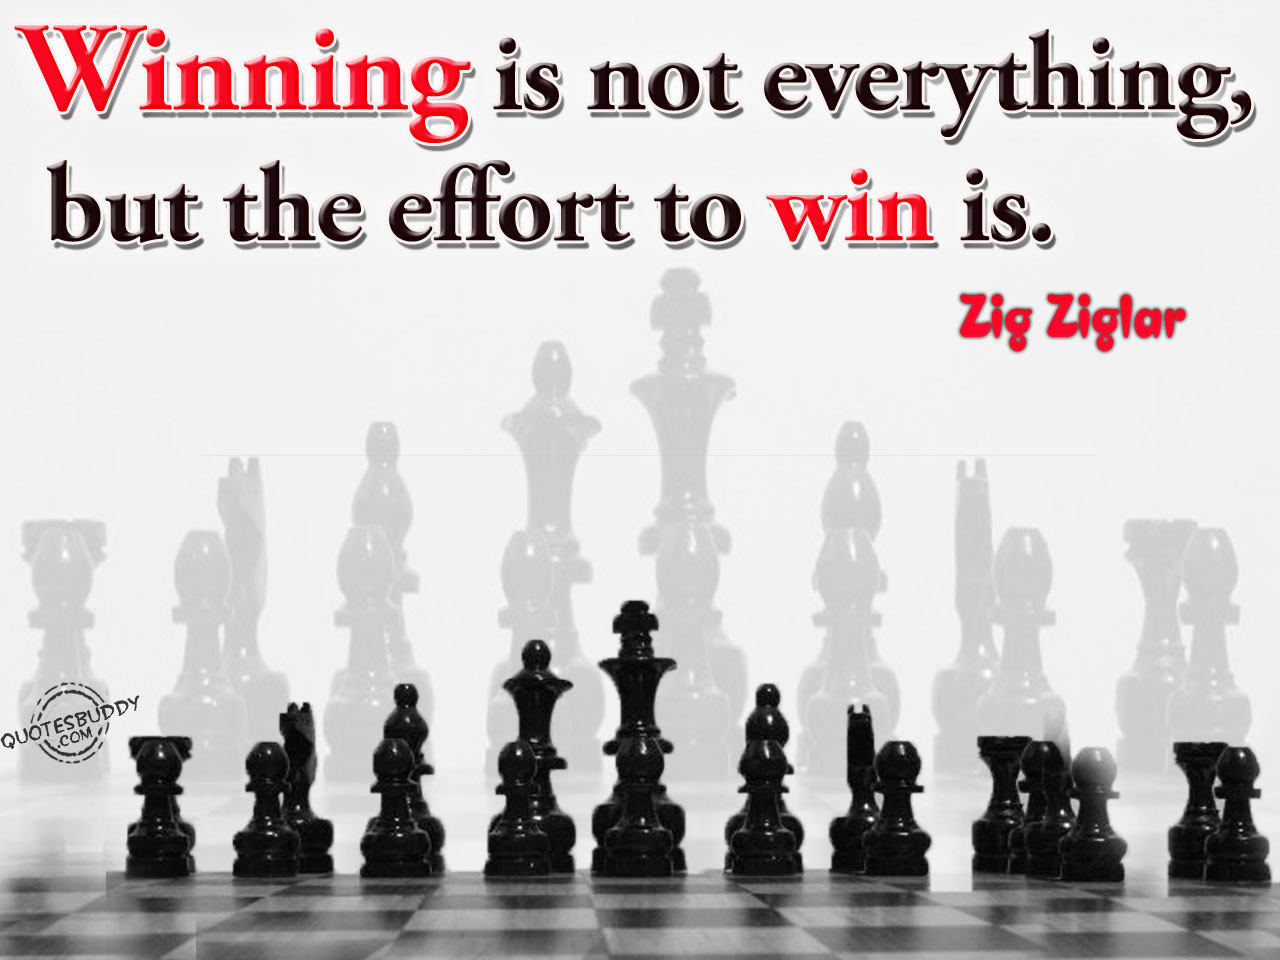 Win quote #5